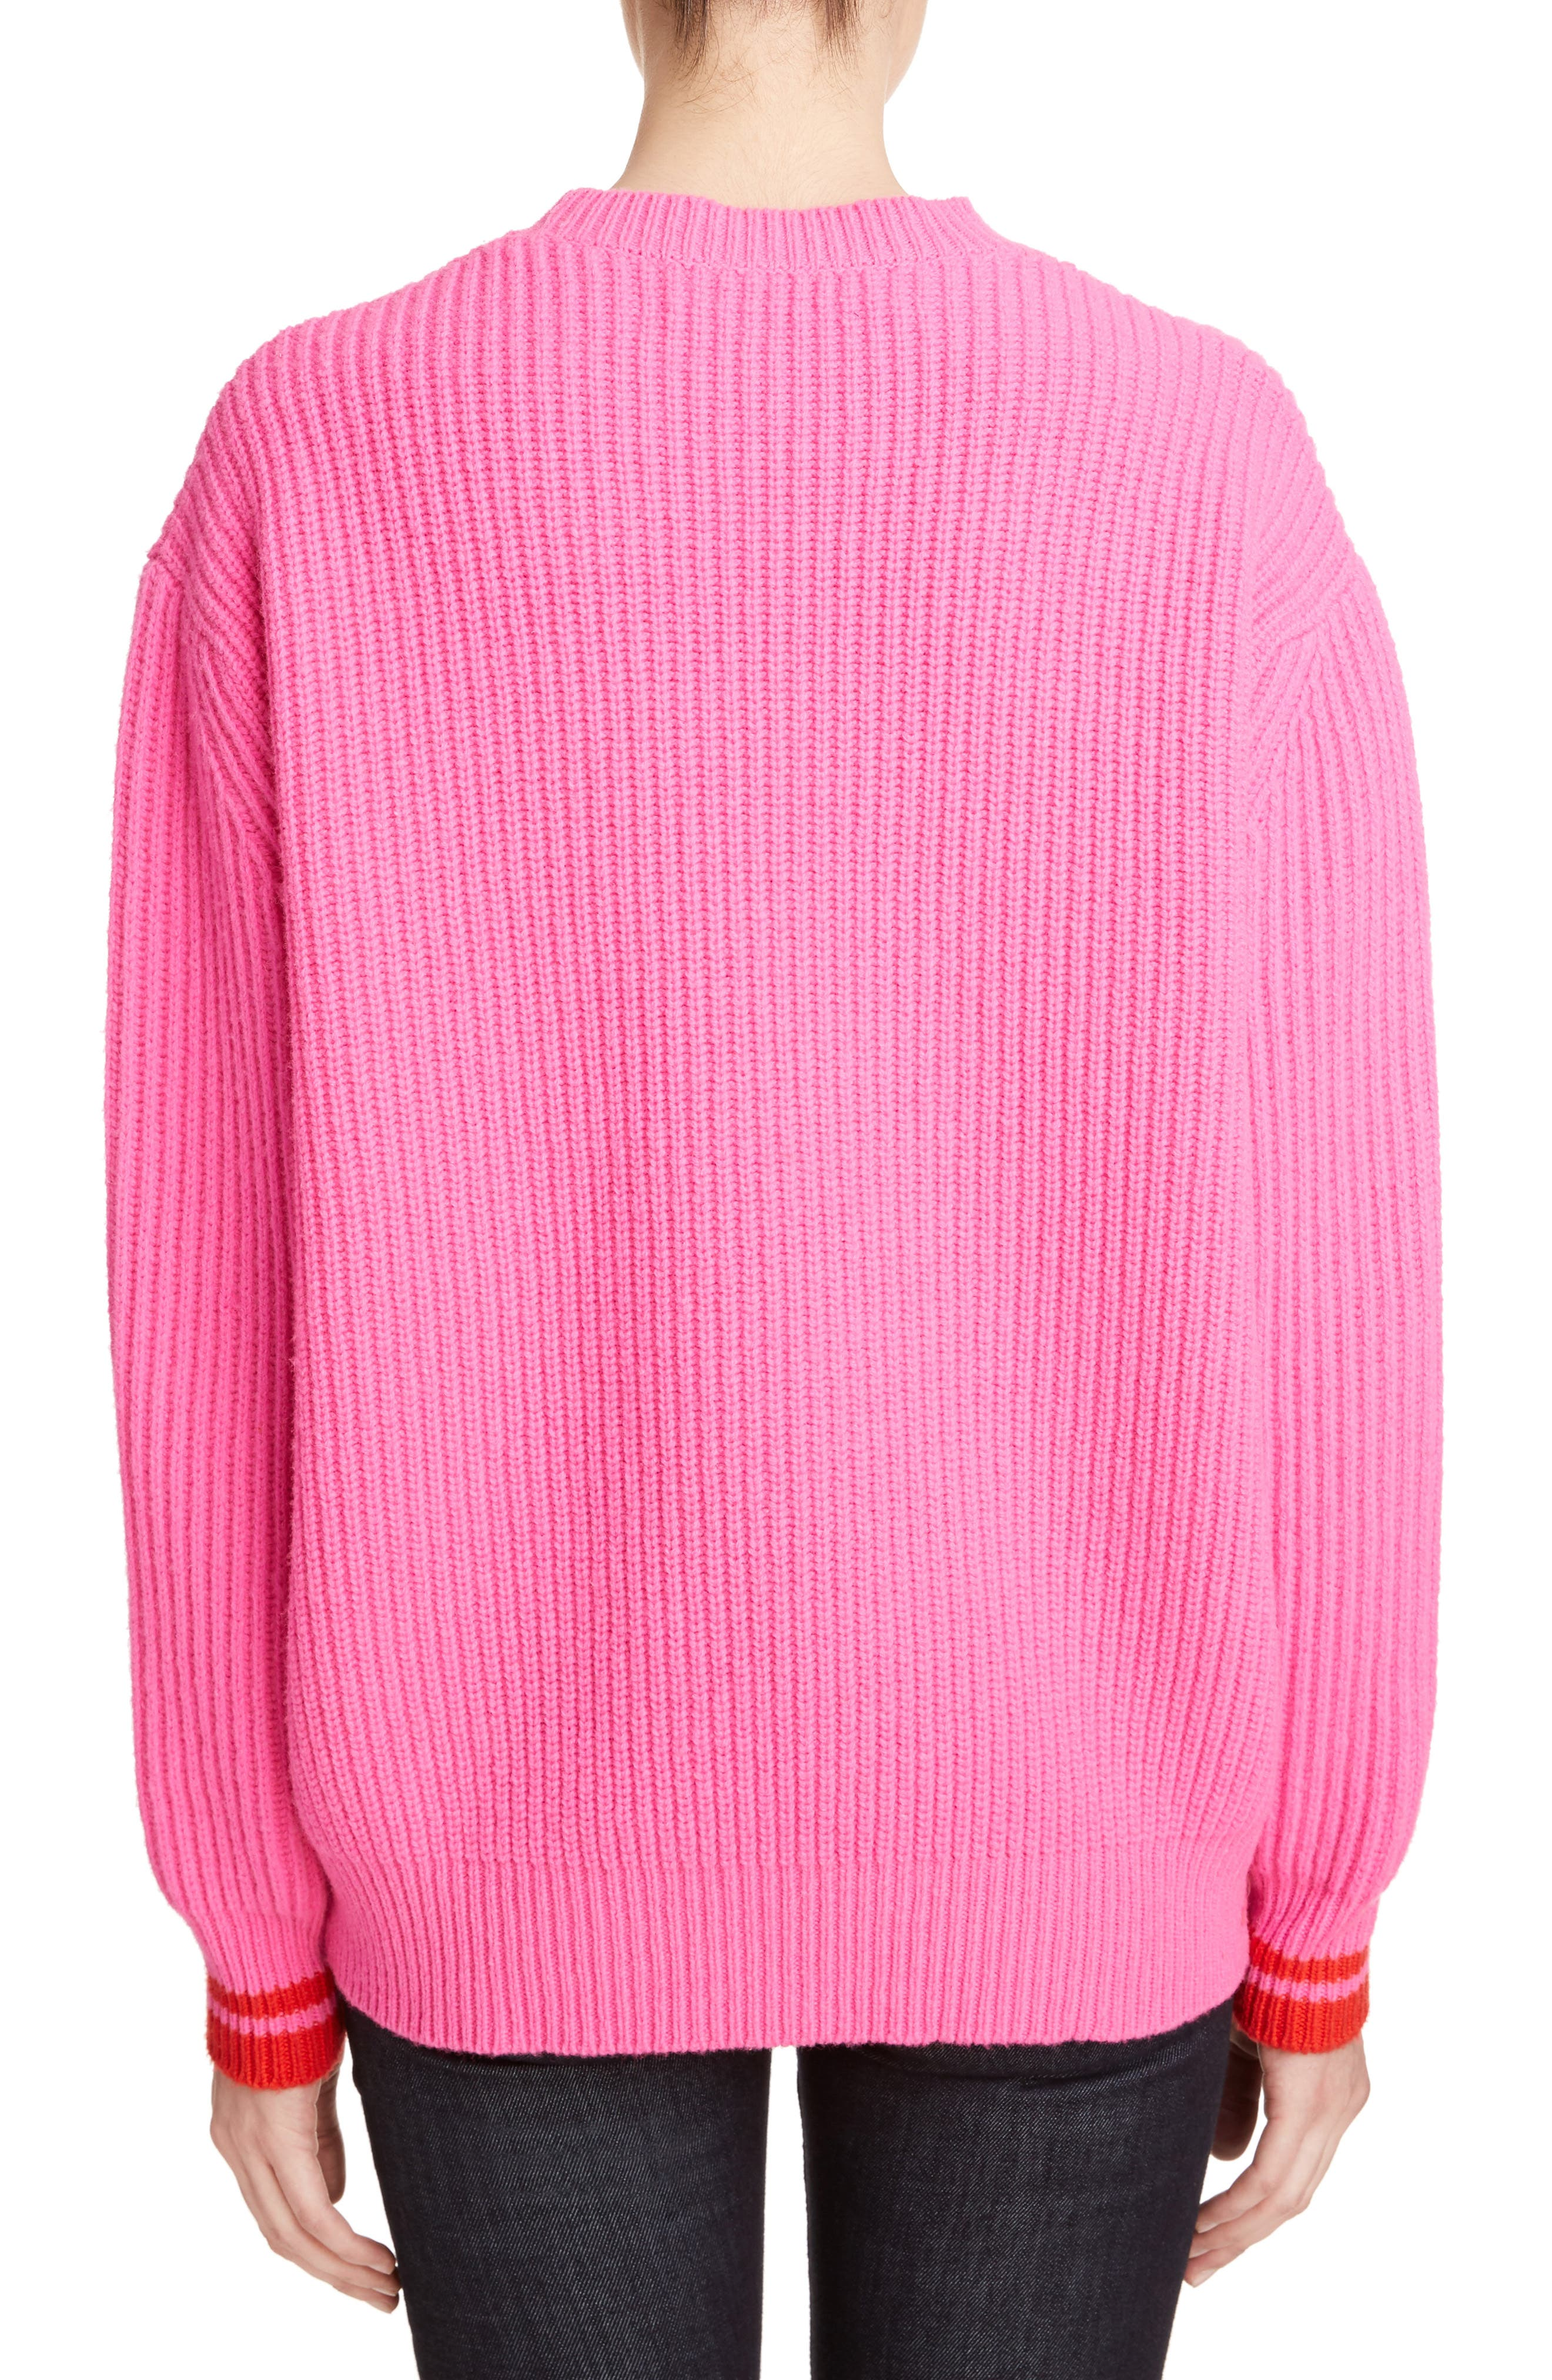 Lambswool Boyfriend Sweater,                             Alternate thumbnail 2, color,                             650